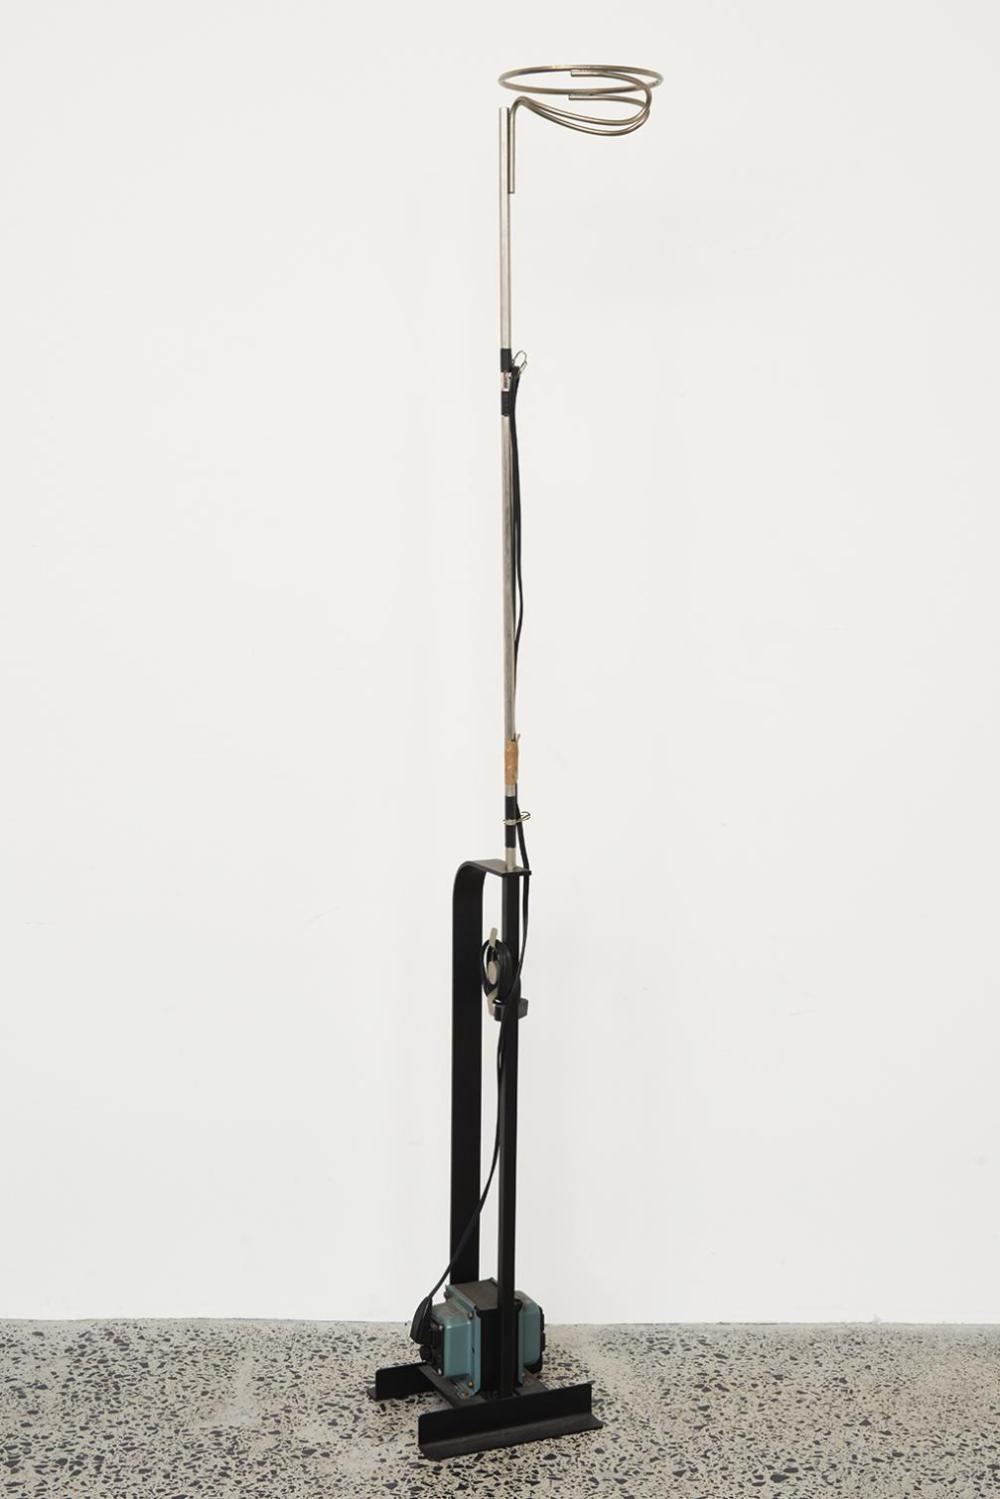 Achille and Pier Giacomo Castiglioni (Italian) Toio Floor Lamp, designed 1962